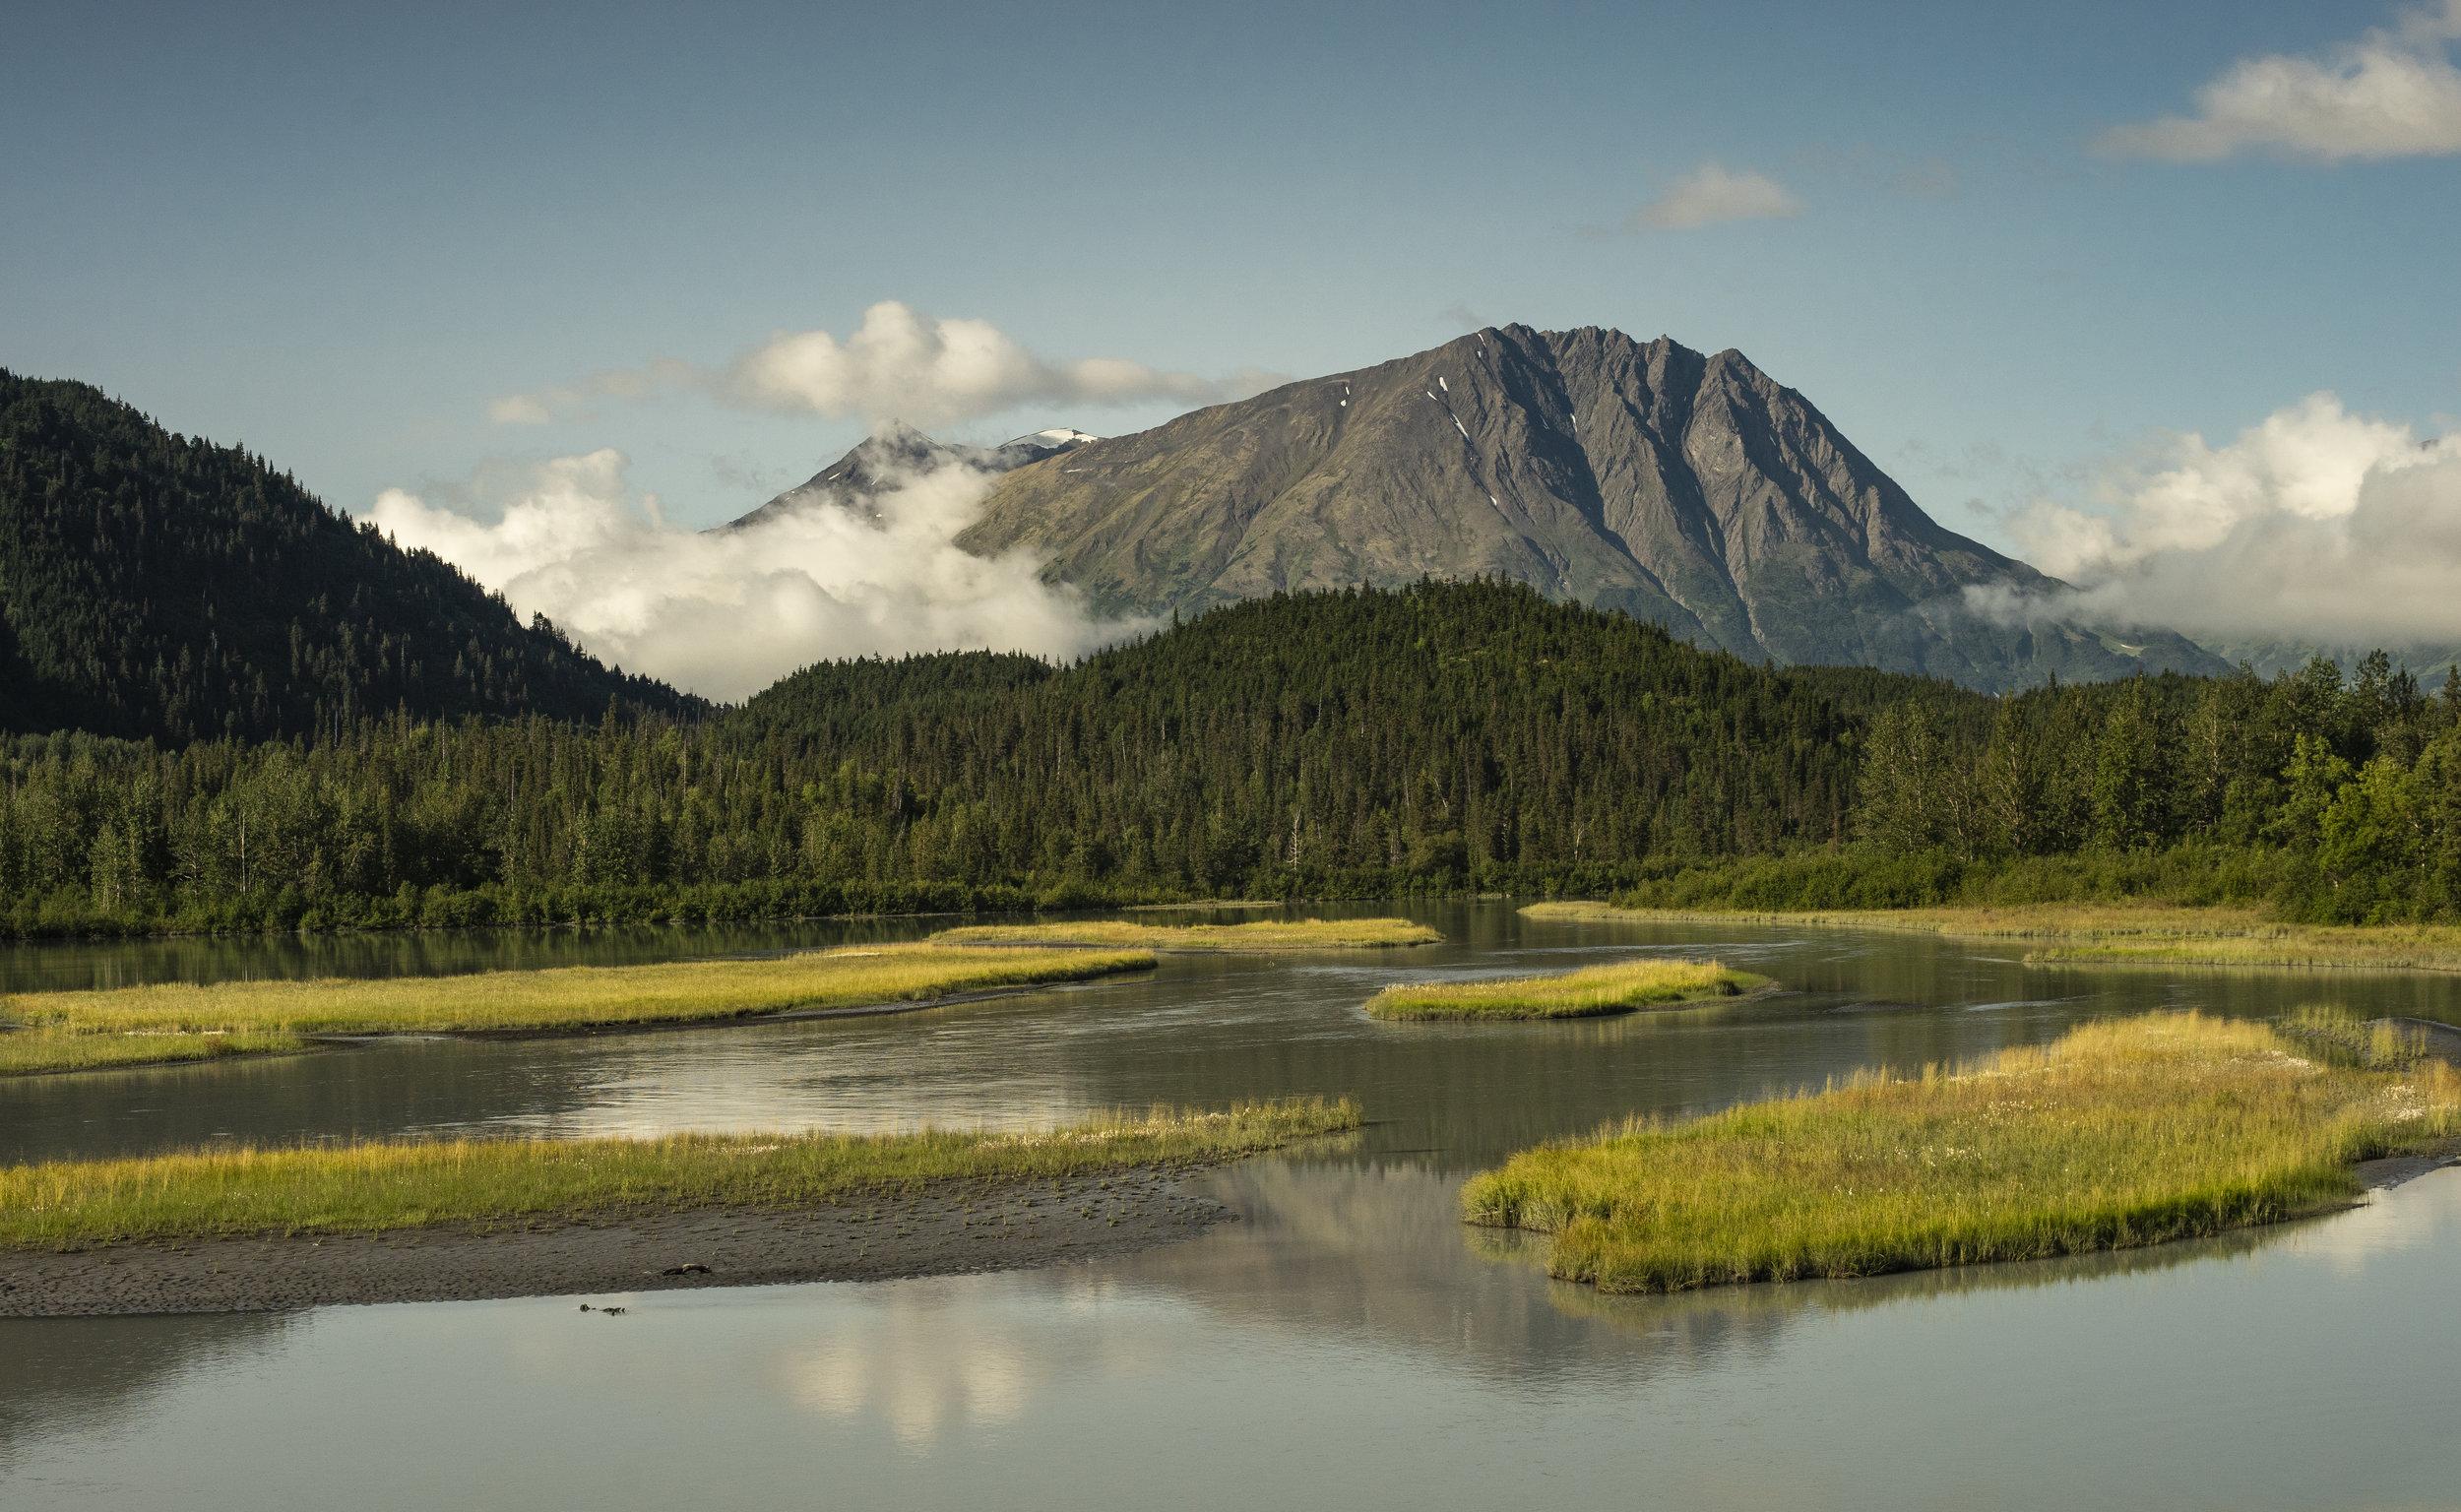 Chugach State Park, Alaska, July 2019